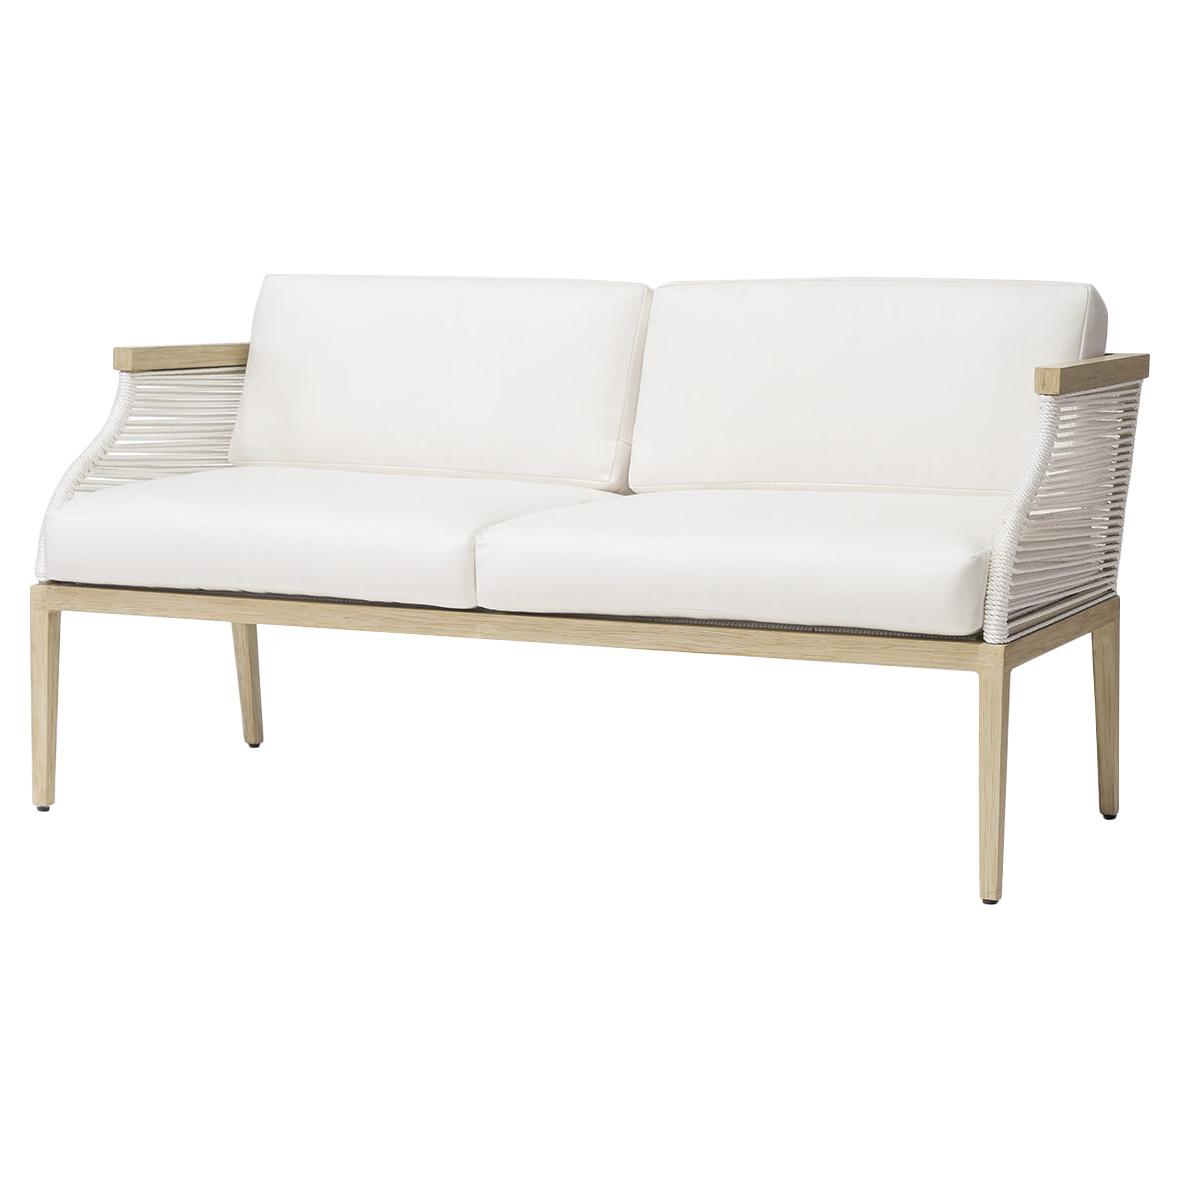 Superb Palecek Sausalito Modern Marine Rope White Outdoor Sofa